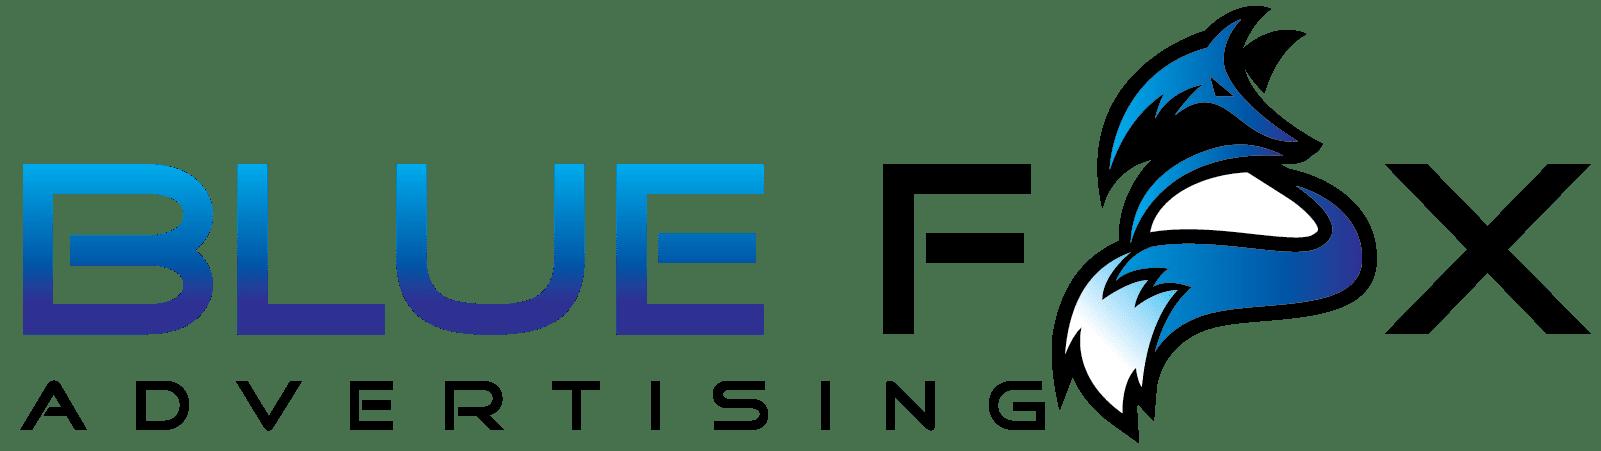 blue fox advertising logo